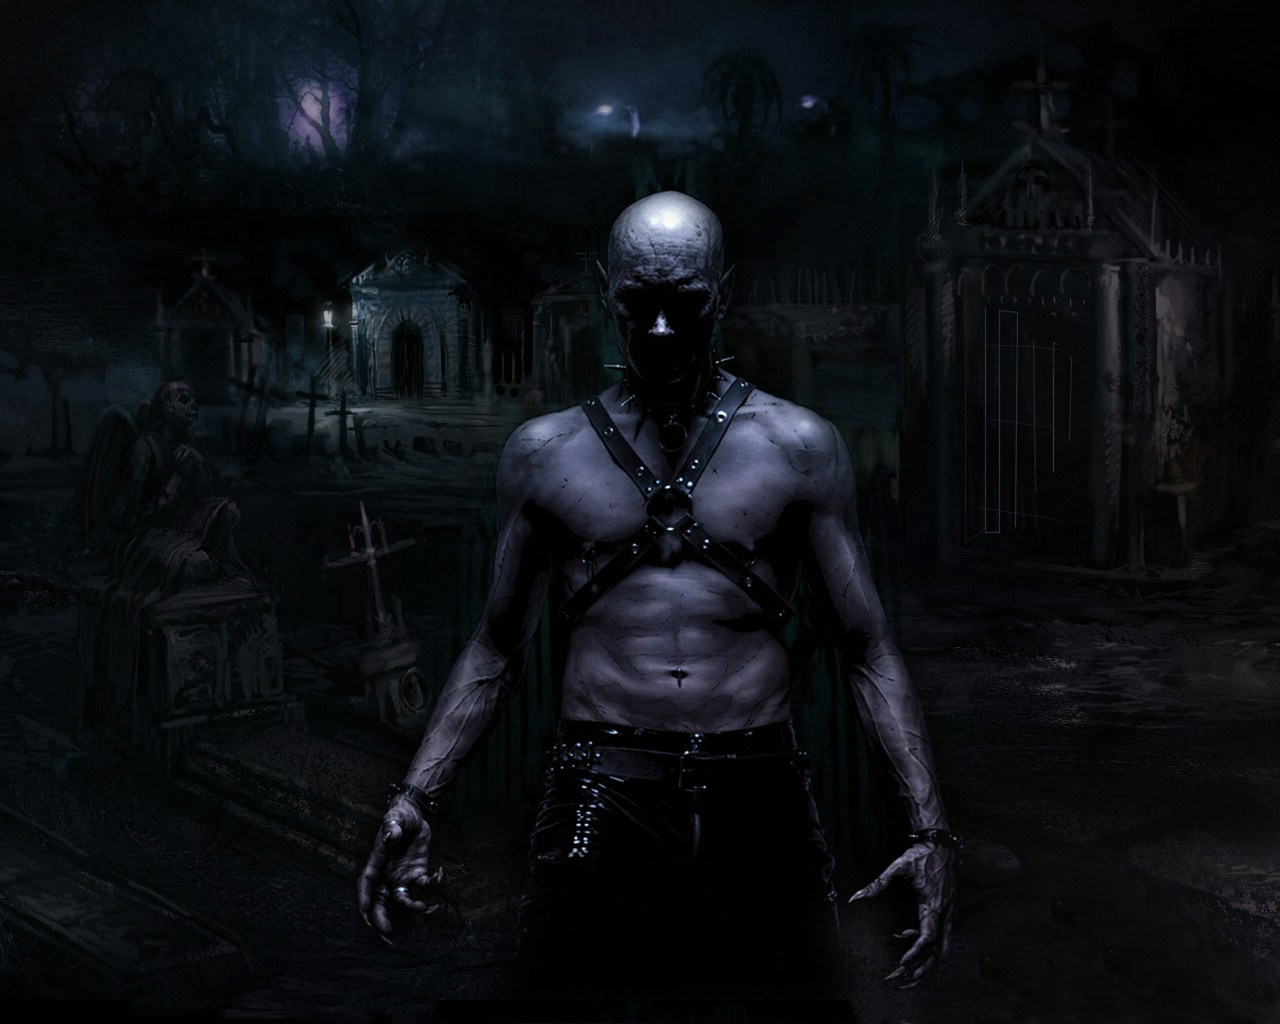 I Will Kill You Dark Gothic Wallpaper